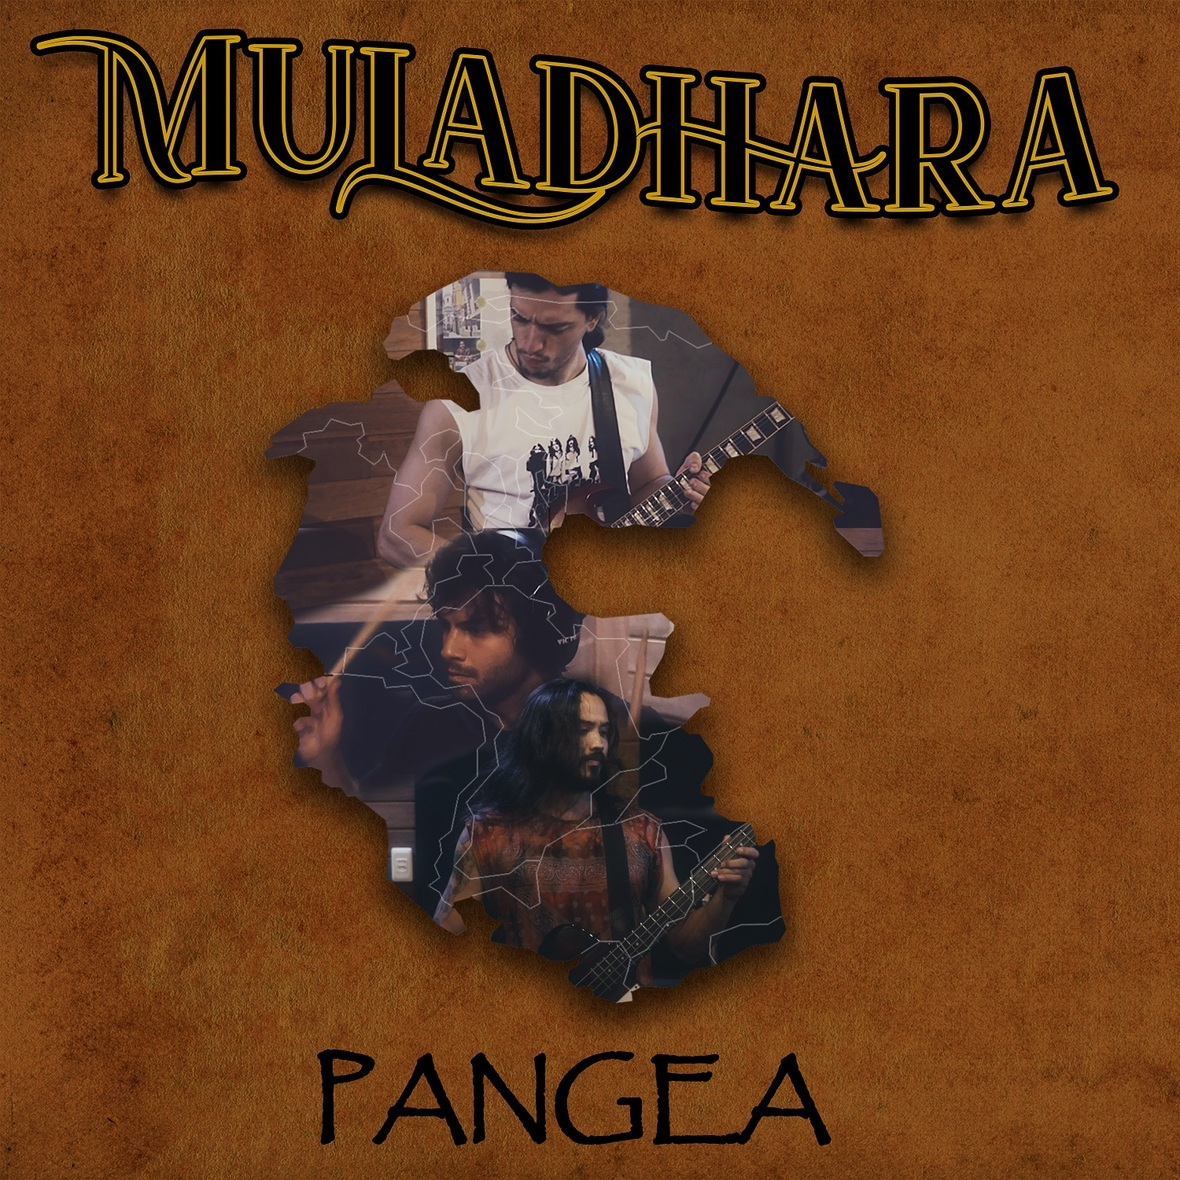 Muladhara Pangea - FINAL